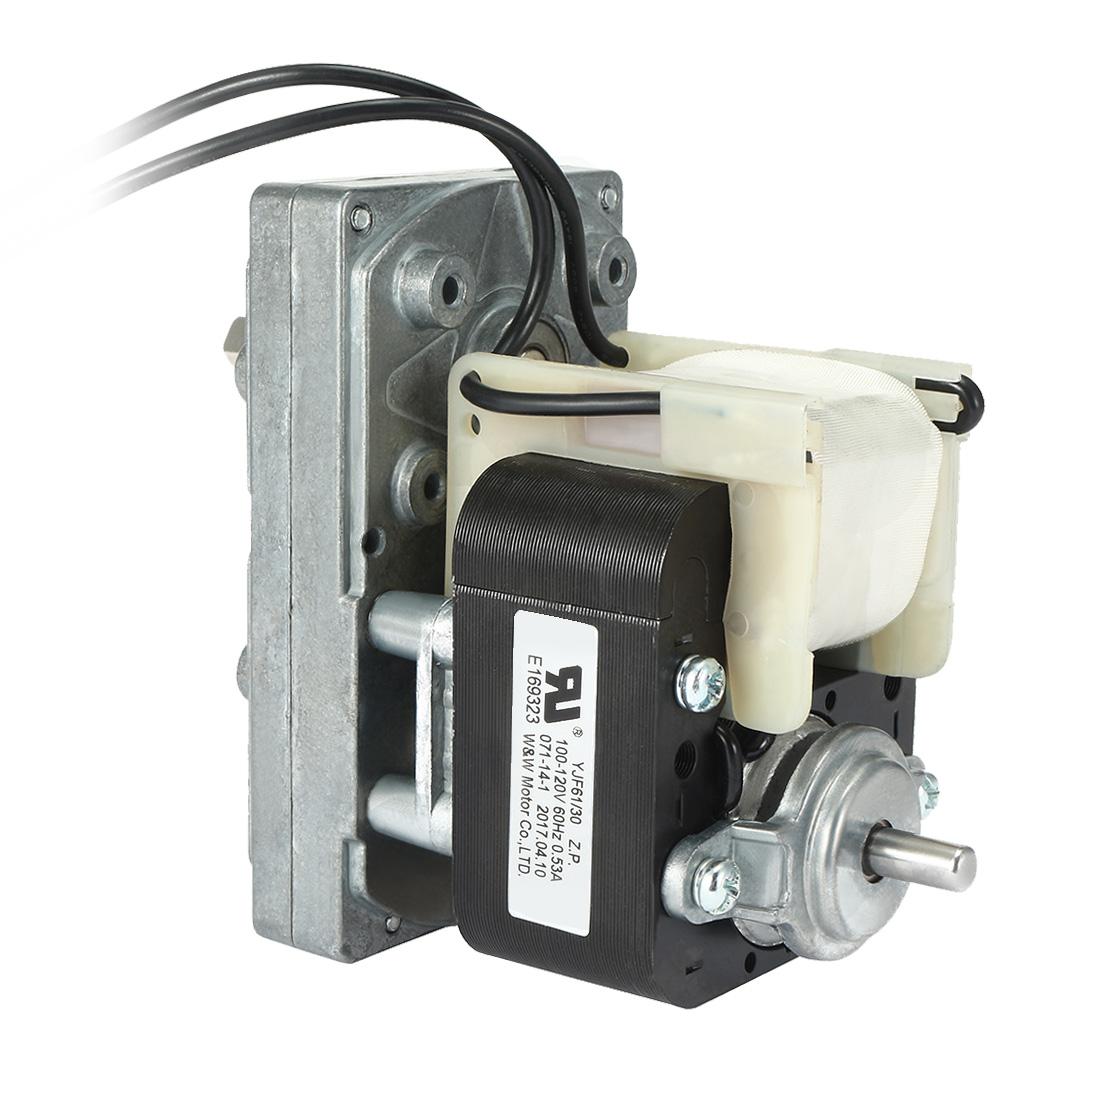 FC-YJ61 AC100V-120V 60Hz 12.6RPM CW Shaded Pole Motor Universal Geared Motor